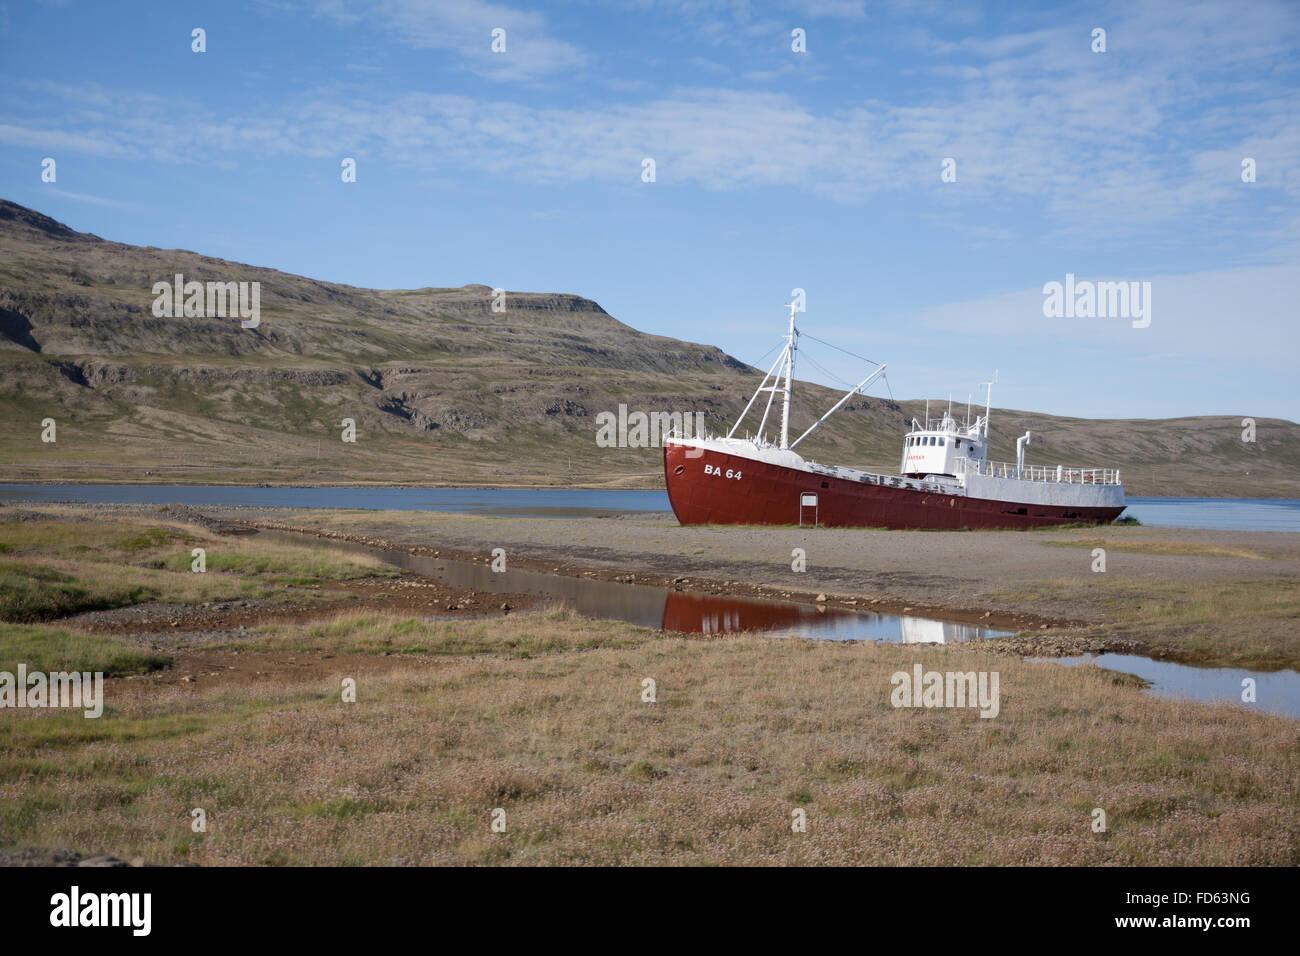 Ship On Shallows Stock Photo